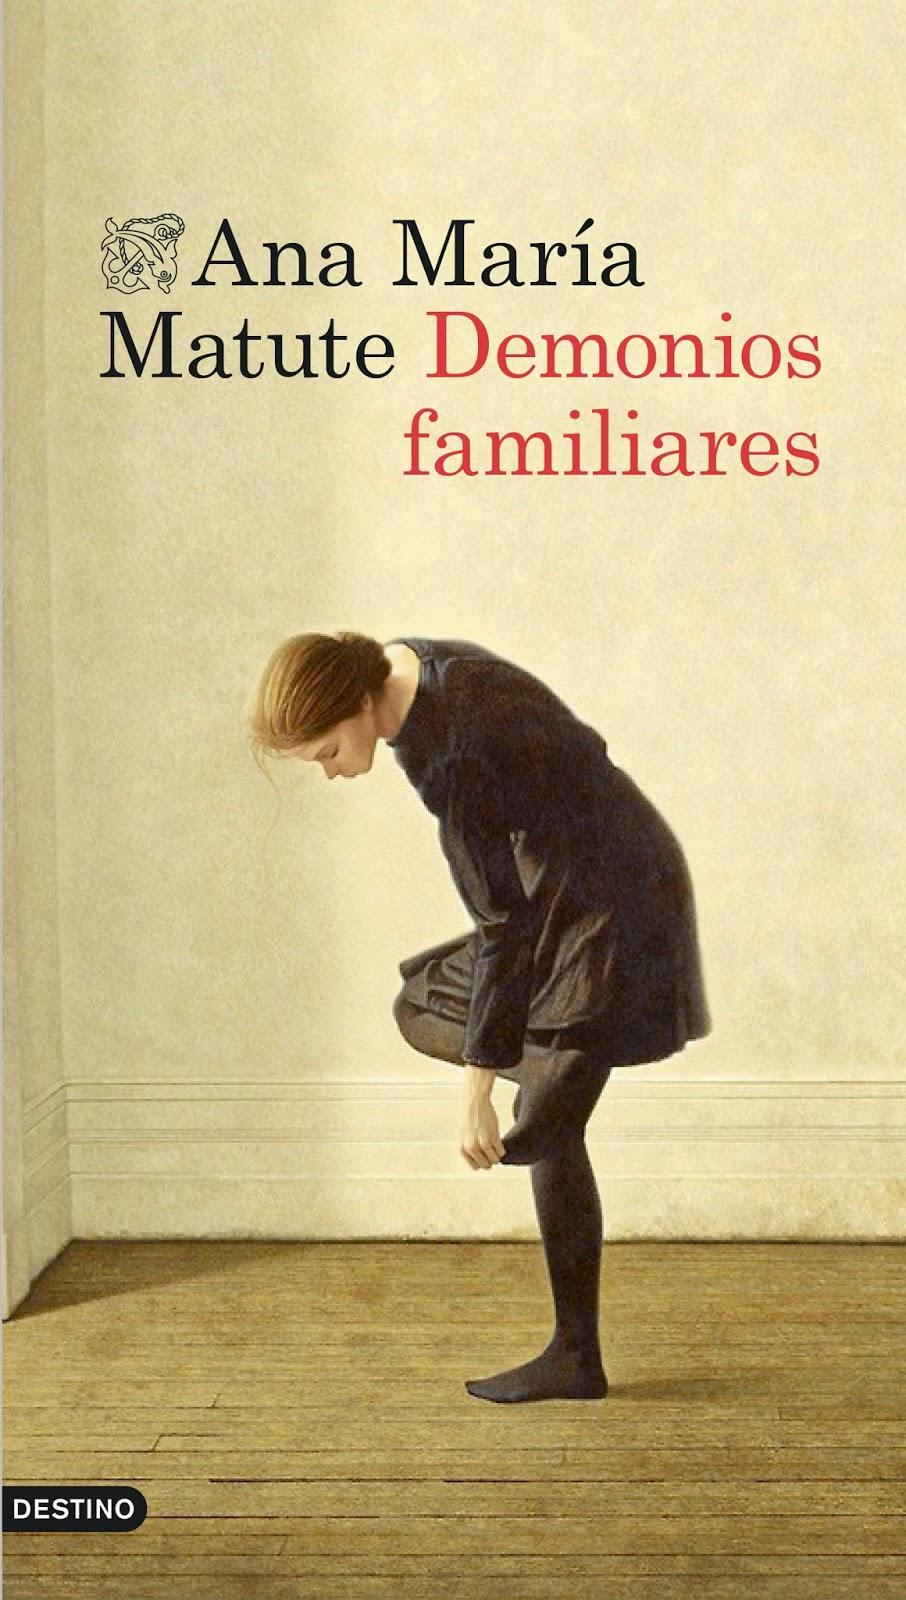 Demonios familiares, de Ana María Matute